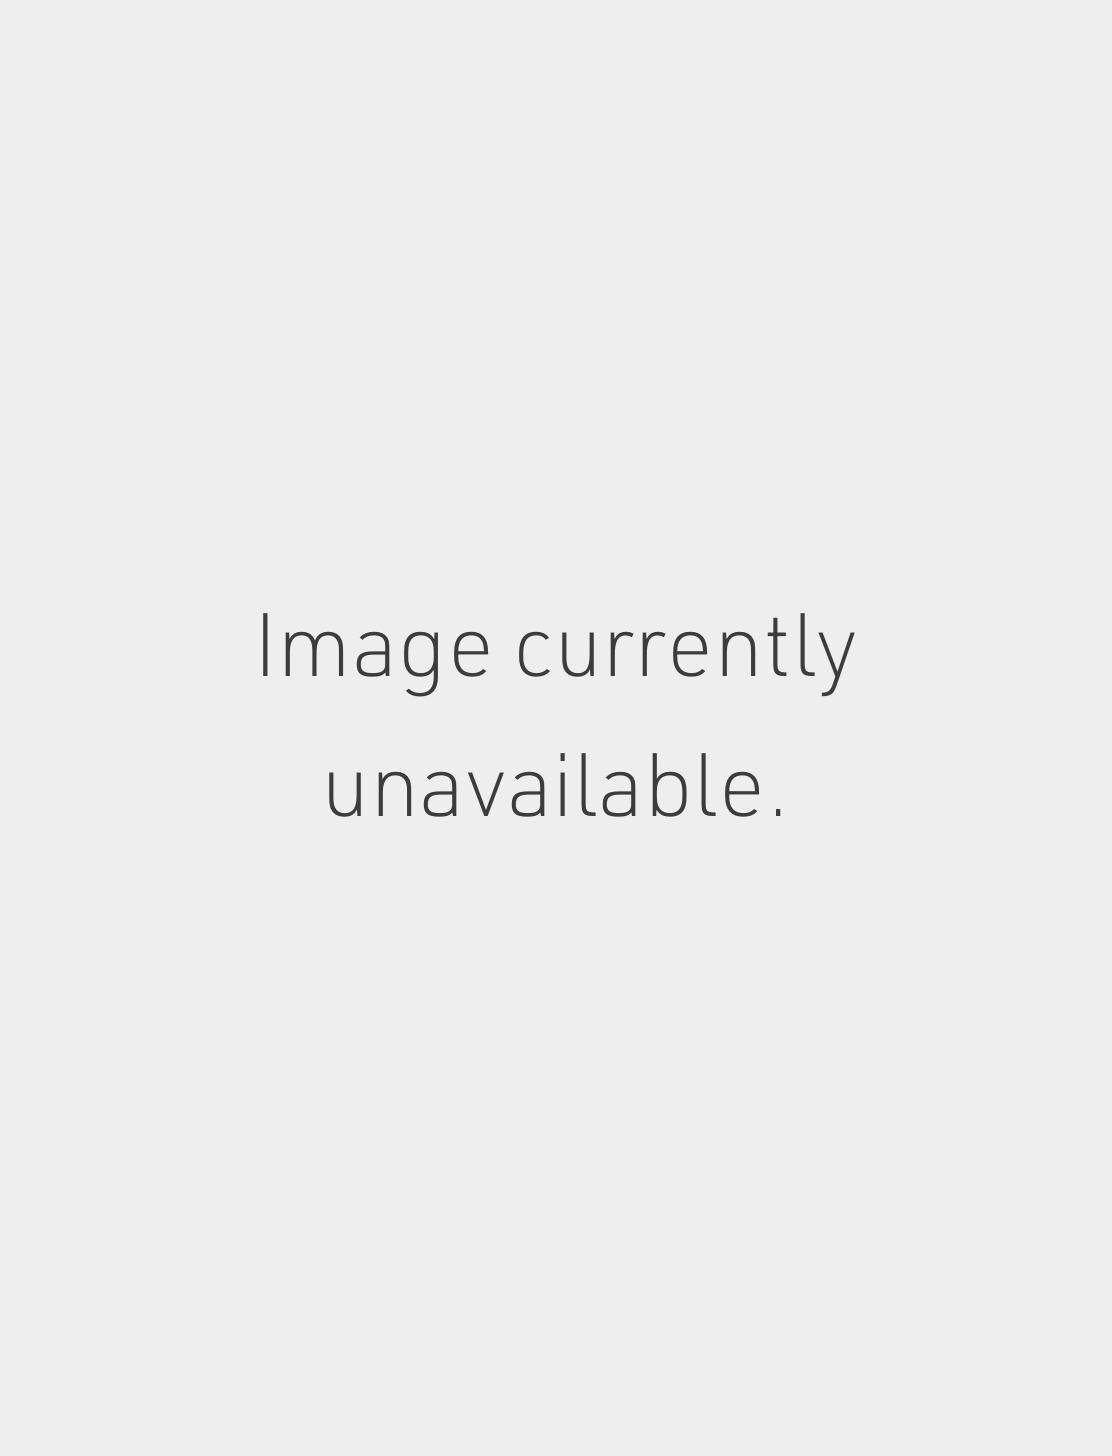 14k 25mm Flat Hoop Earring Image #1